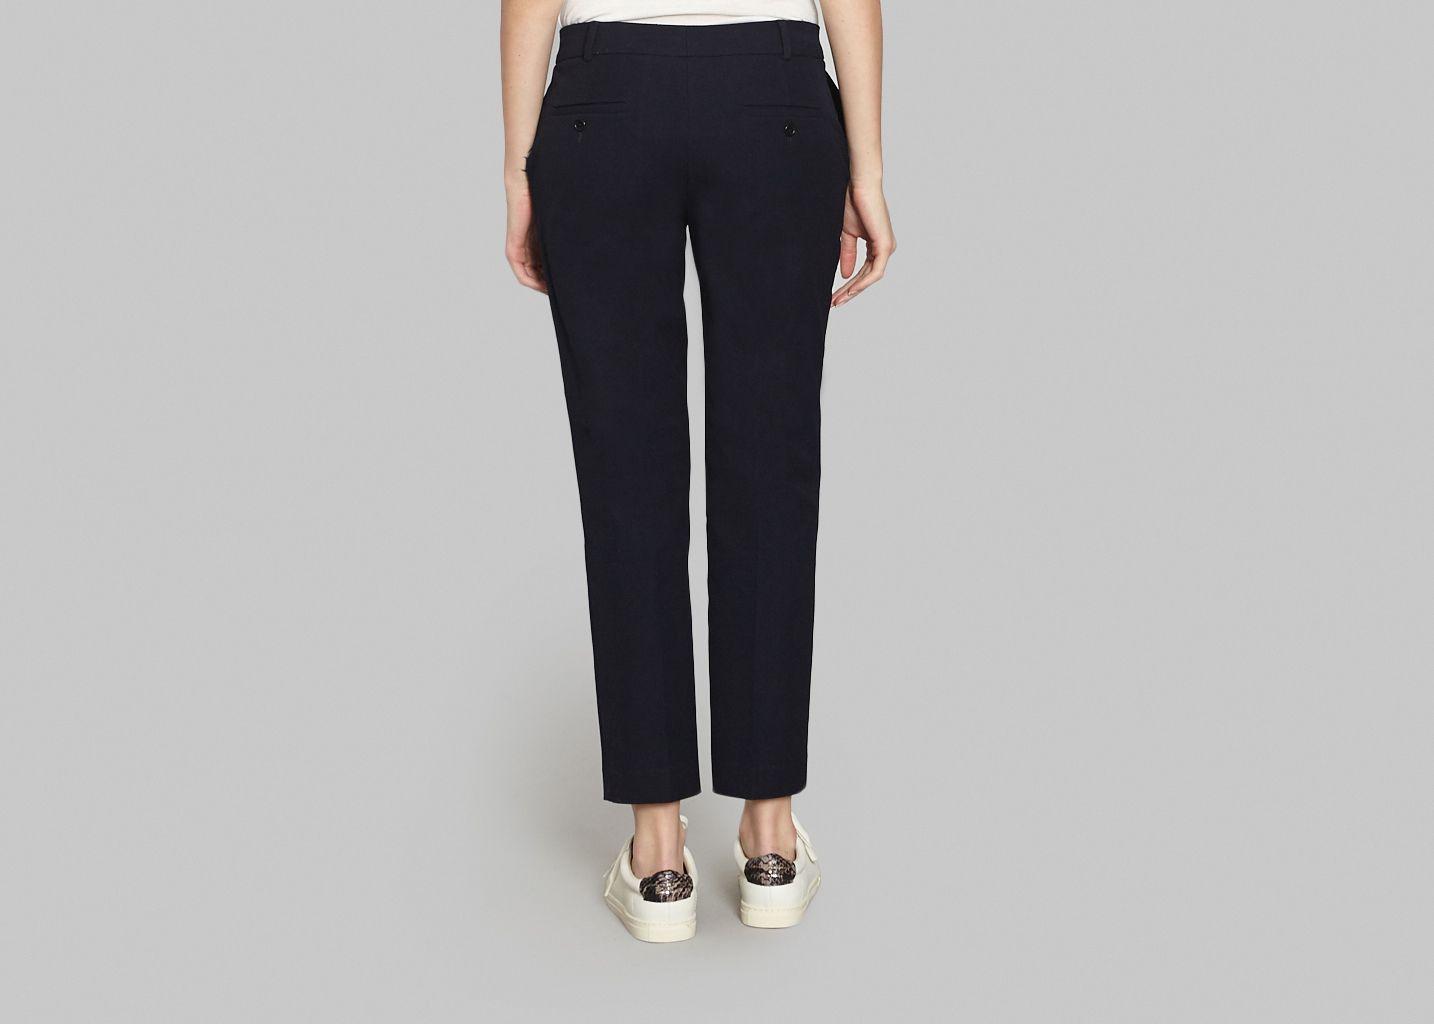 Pantalon Palmora - Leon & Harper